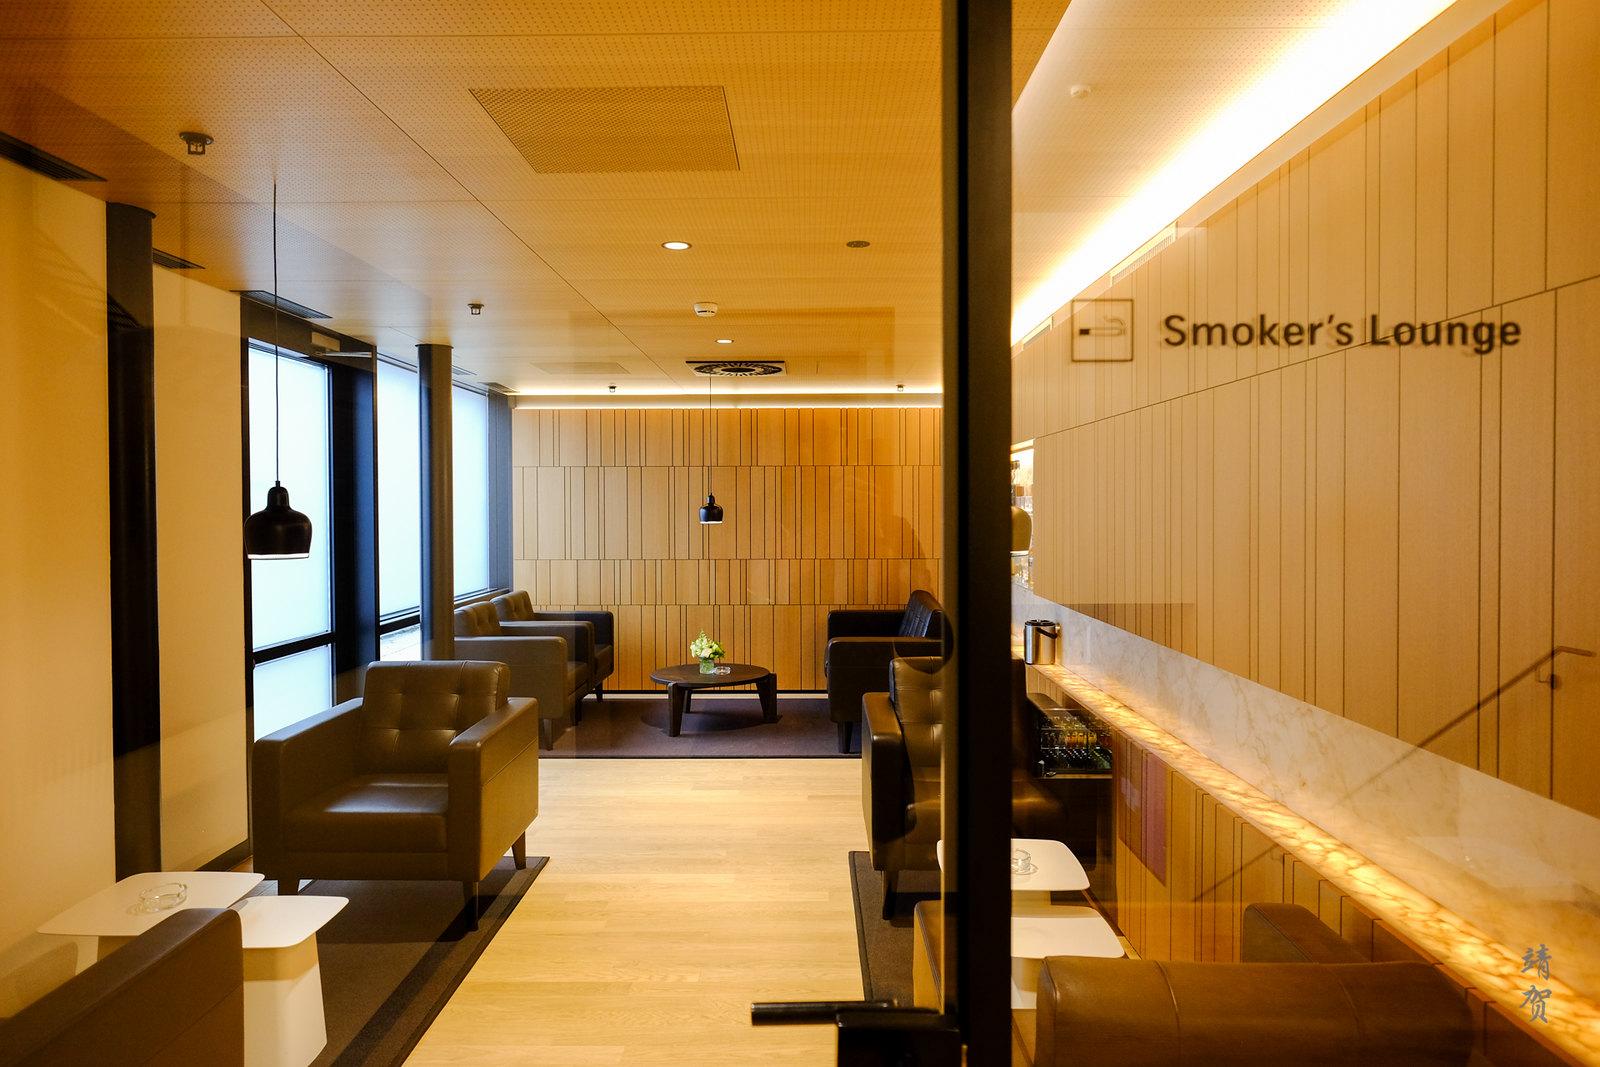 Smoker's Lounge